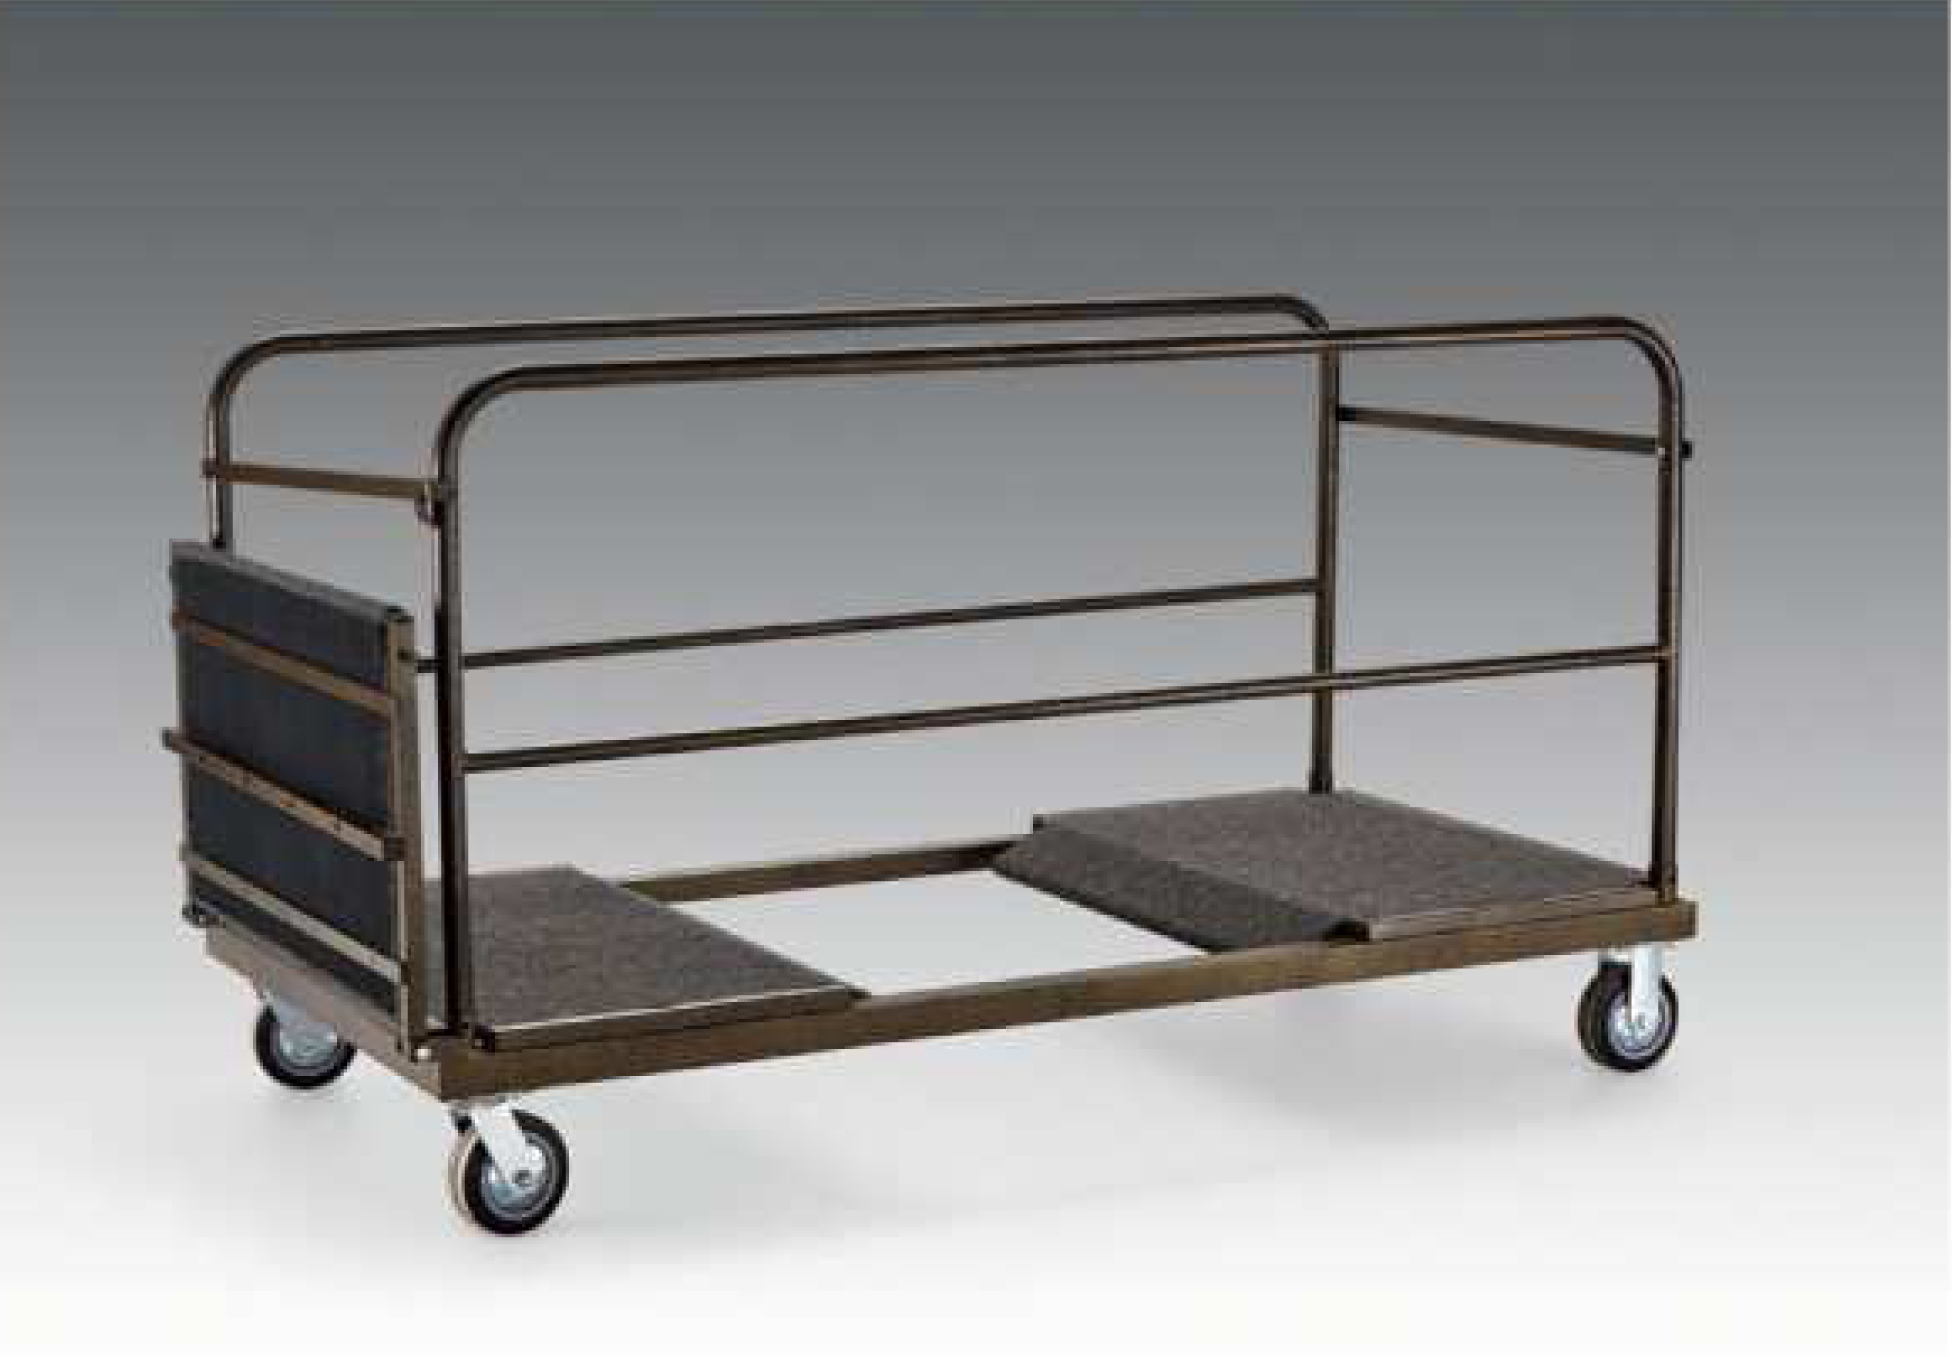 Table Storage U0026 Handling